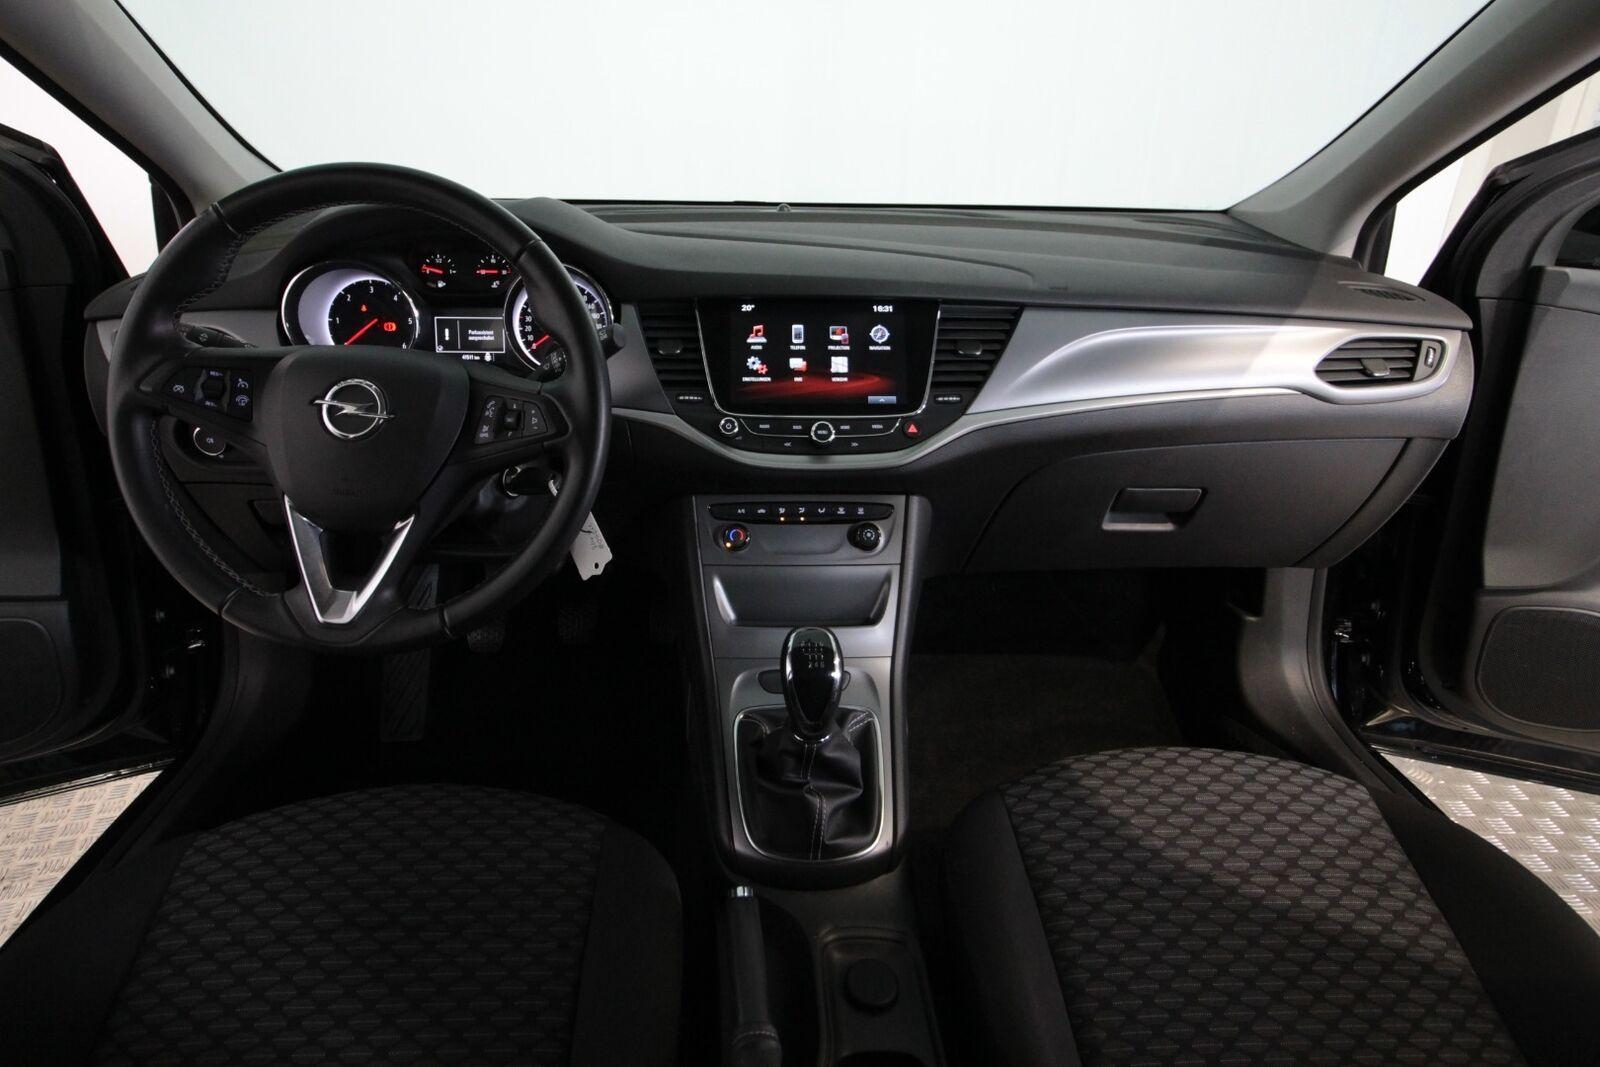 Opel Astra CDTi 110 Edition ST